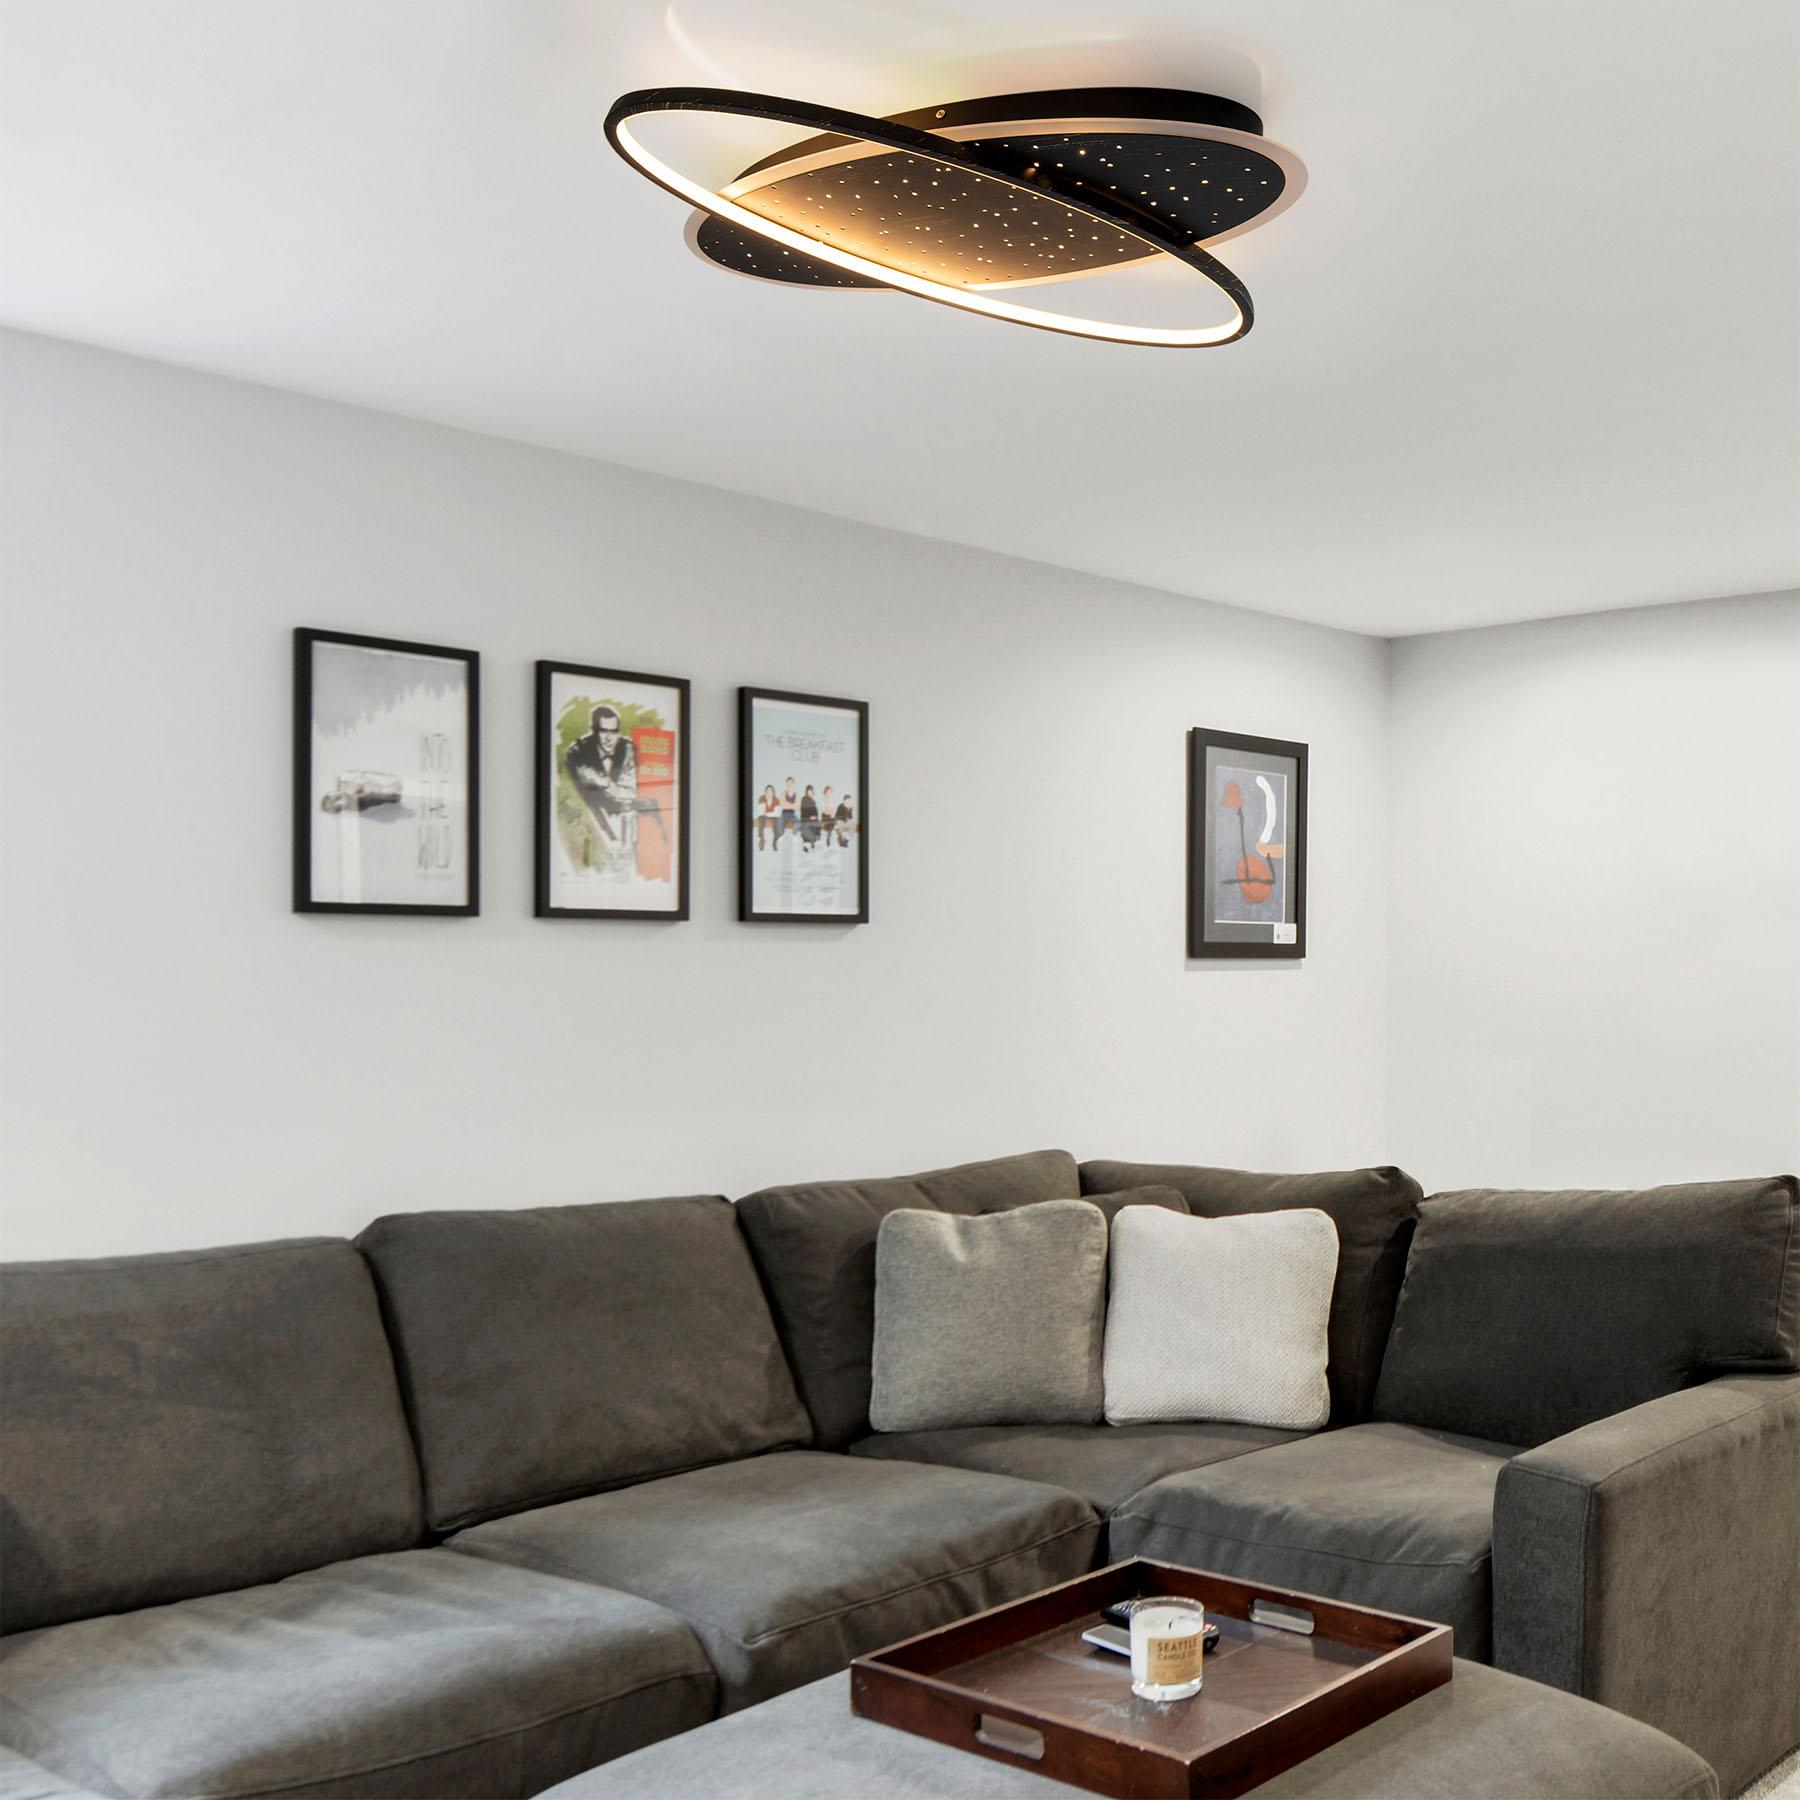 Lampa sufitowa LED Venus, rozgwieżdżone niebo